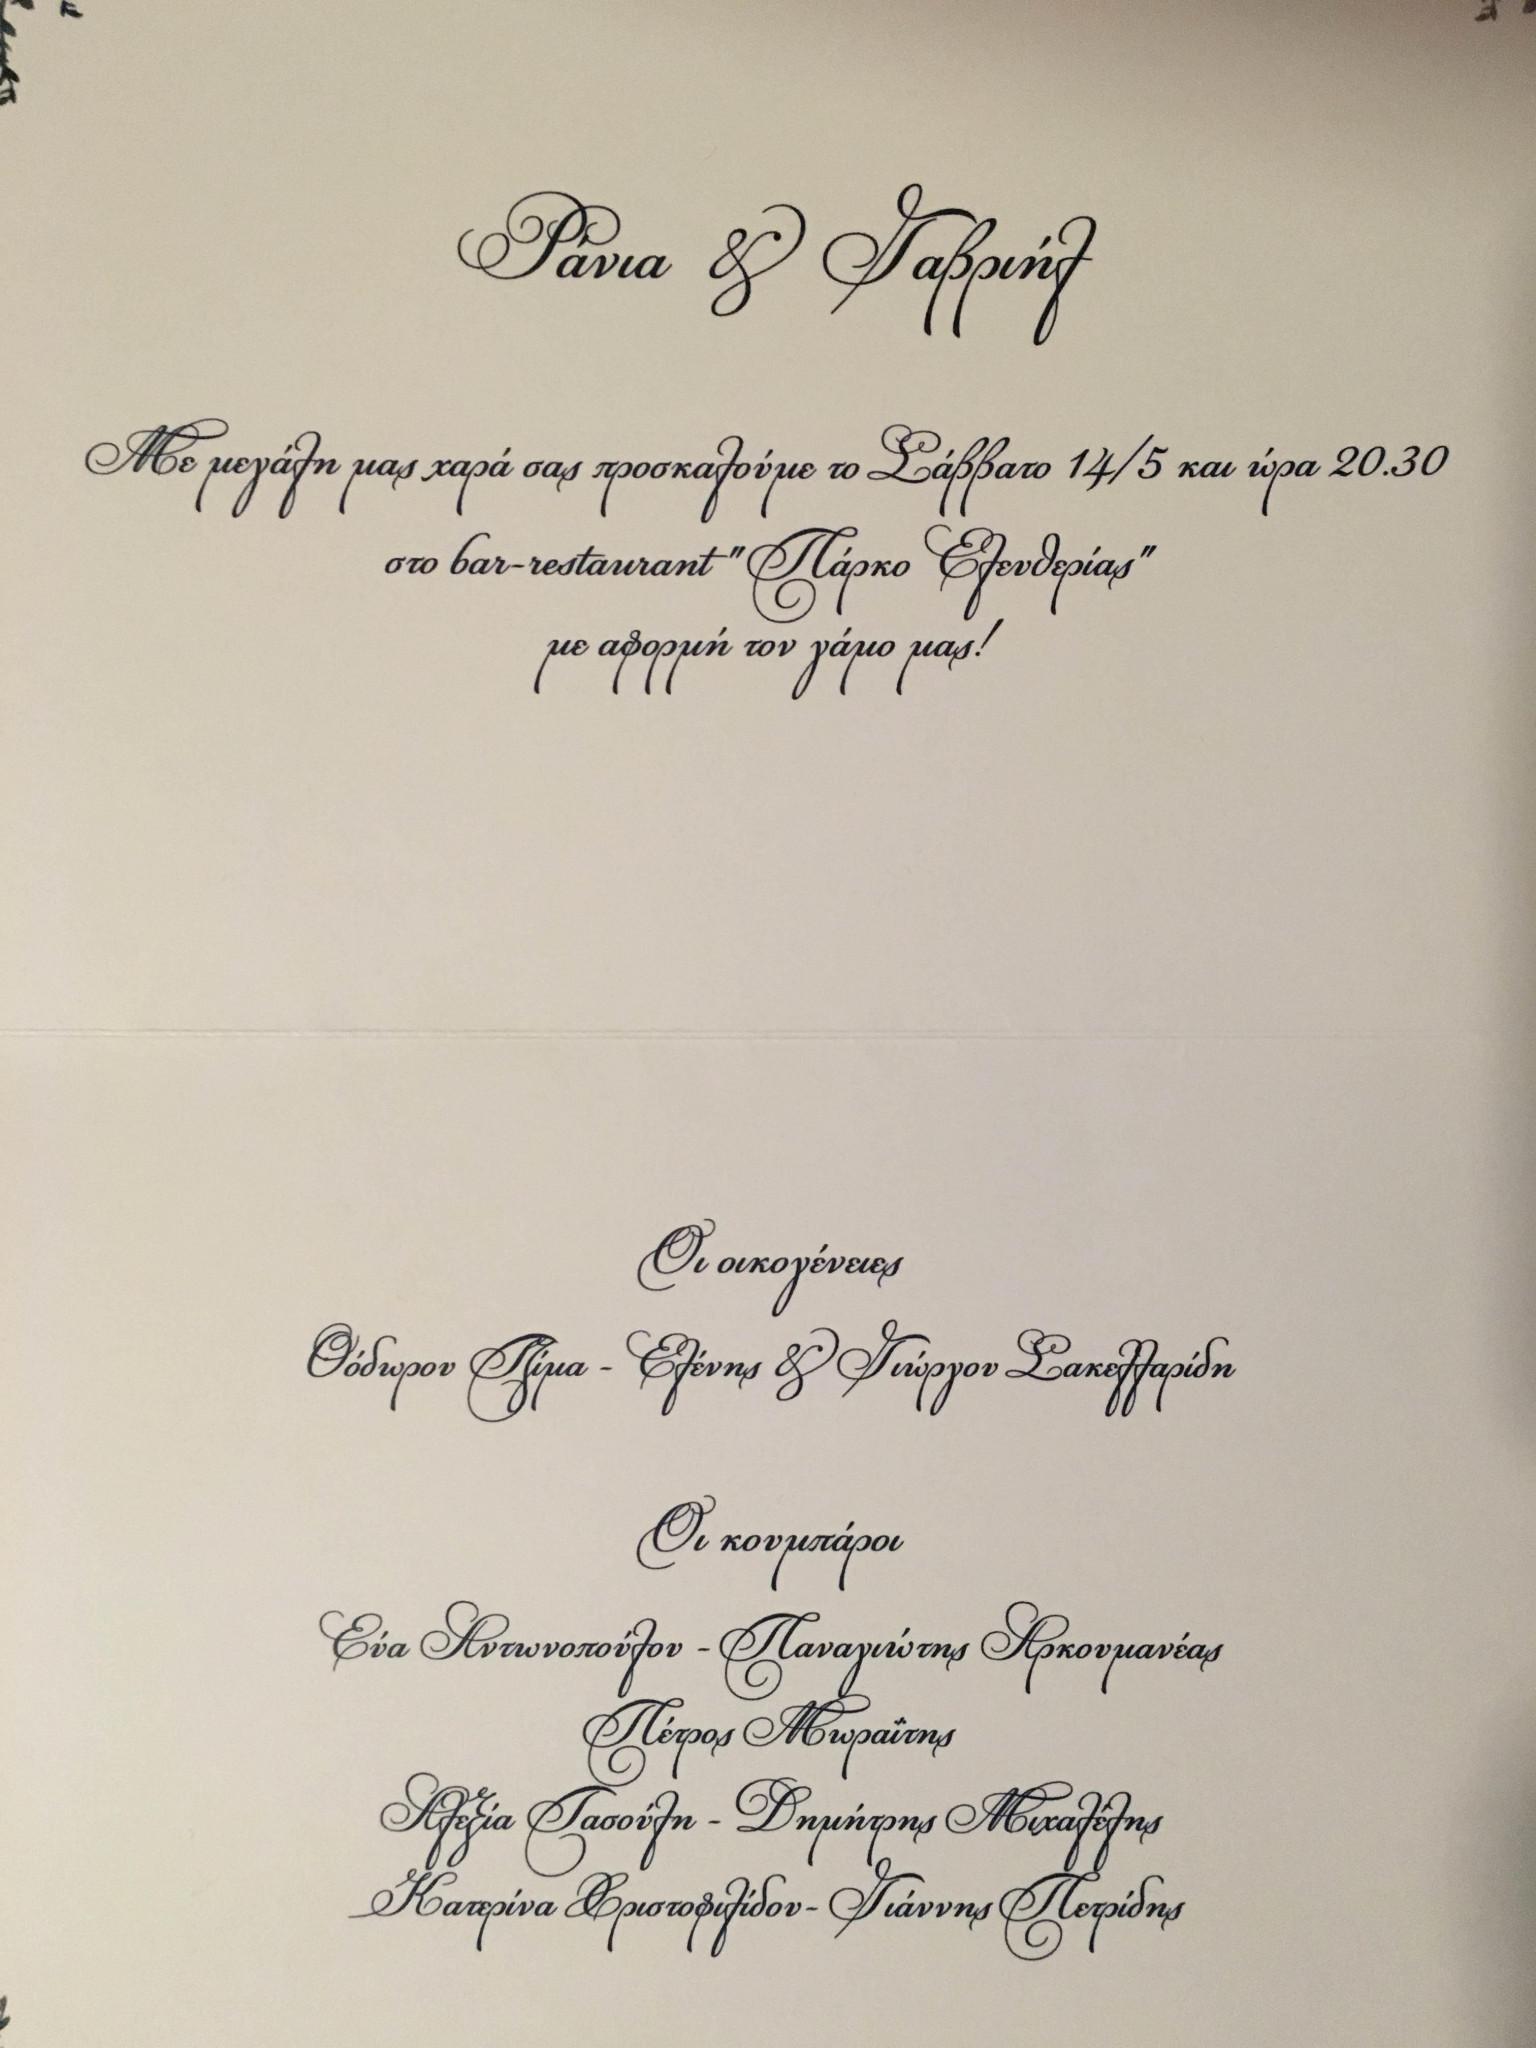 rania-prosklitirio-1a2 Αυτό είναι το προσκλητήριο γάμου του Σακελλαρίδη με την Ράνια Τζίμα [εικόνα]